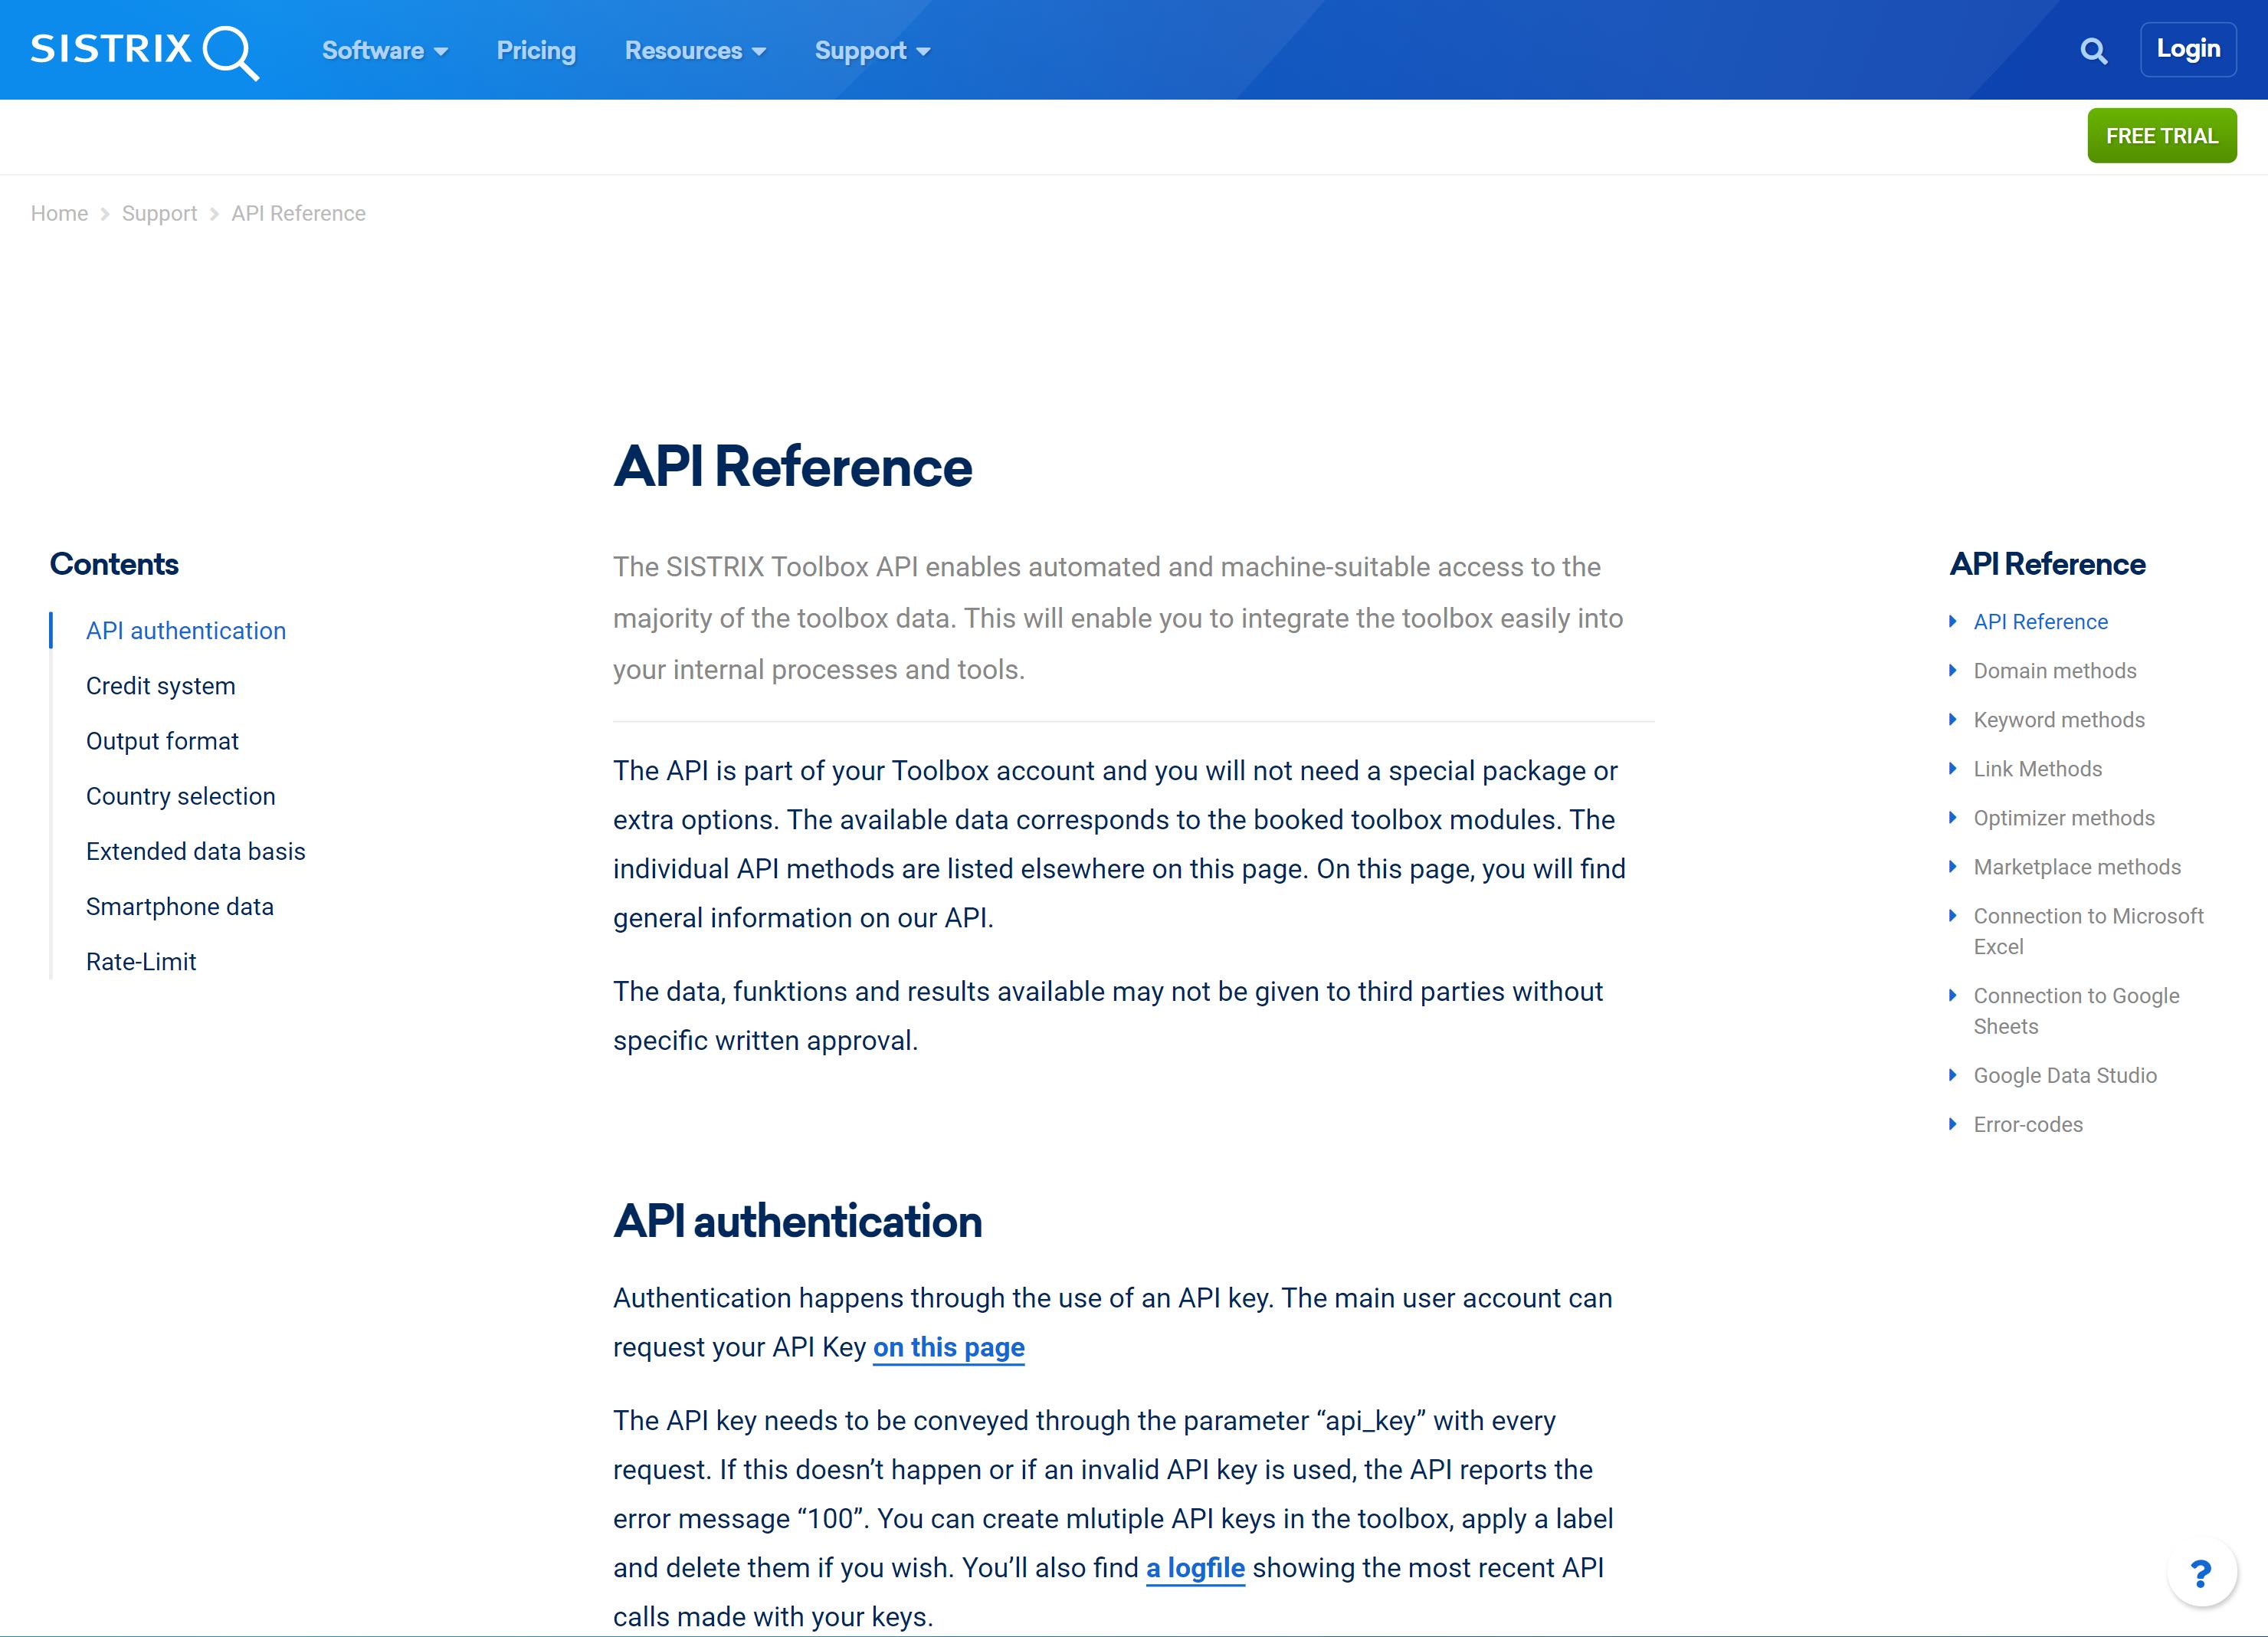 SISTRIX API documentation example